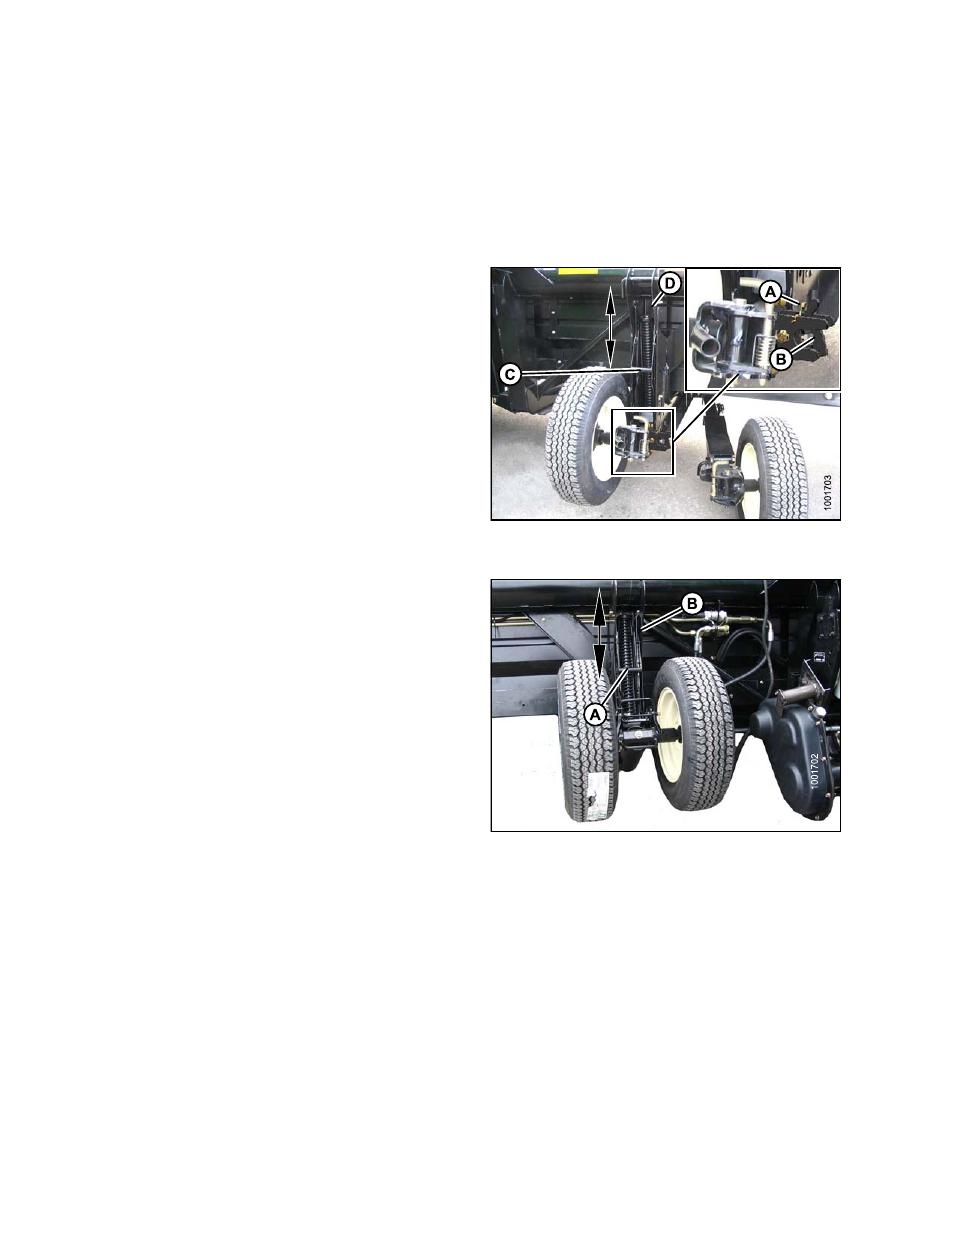 Adjusting stabilizer/slow speed transport wheels | MacDon